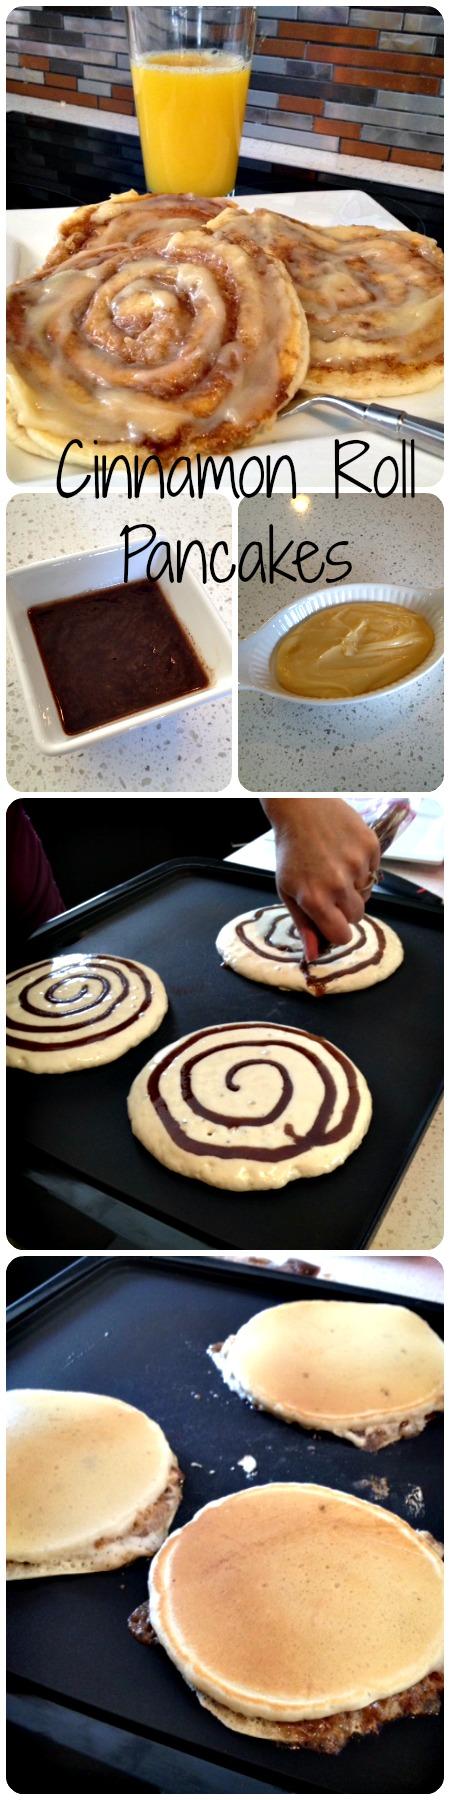 Cinnamon Roll Pancakes Recipe Weve Tried It